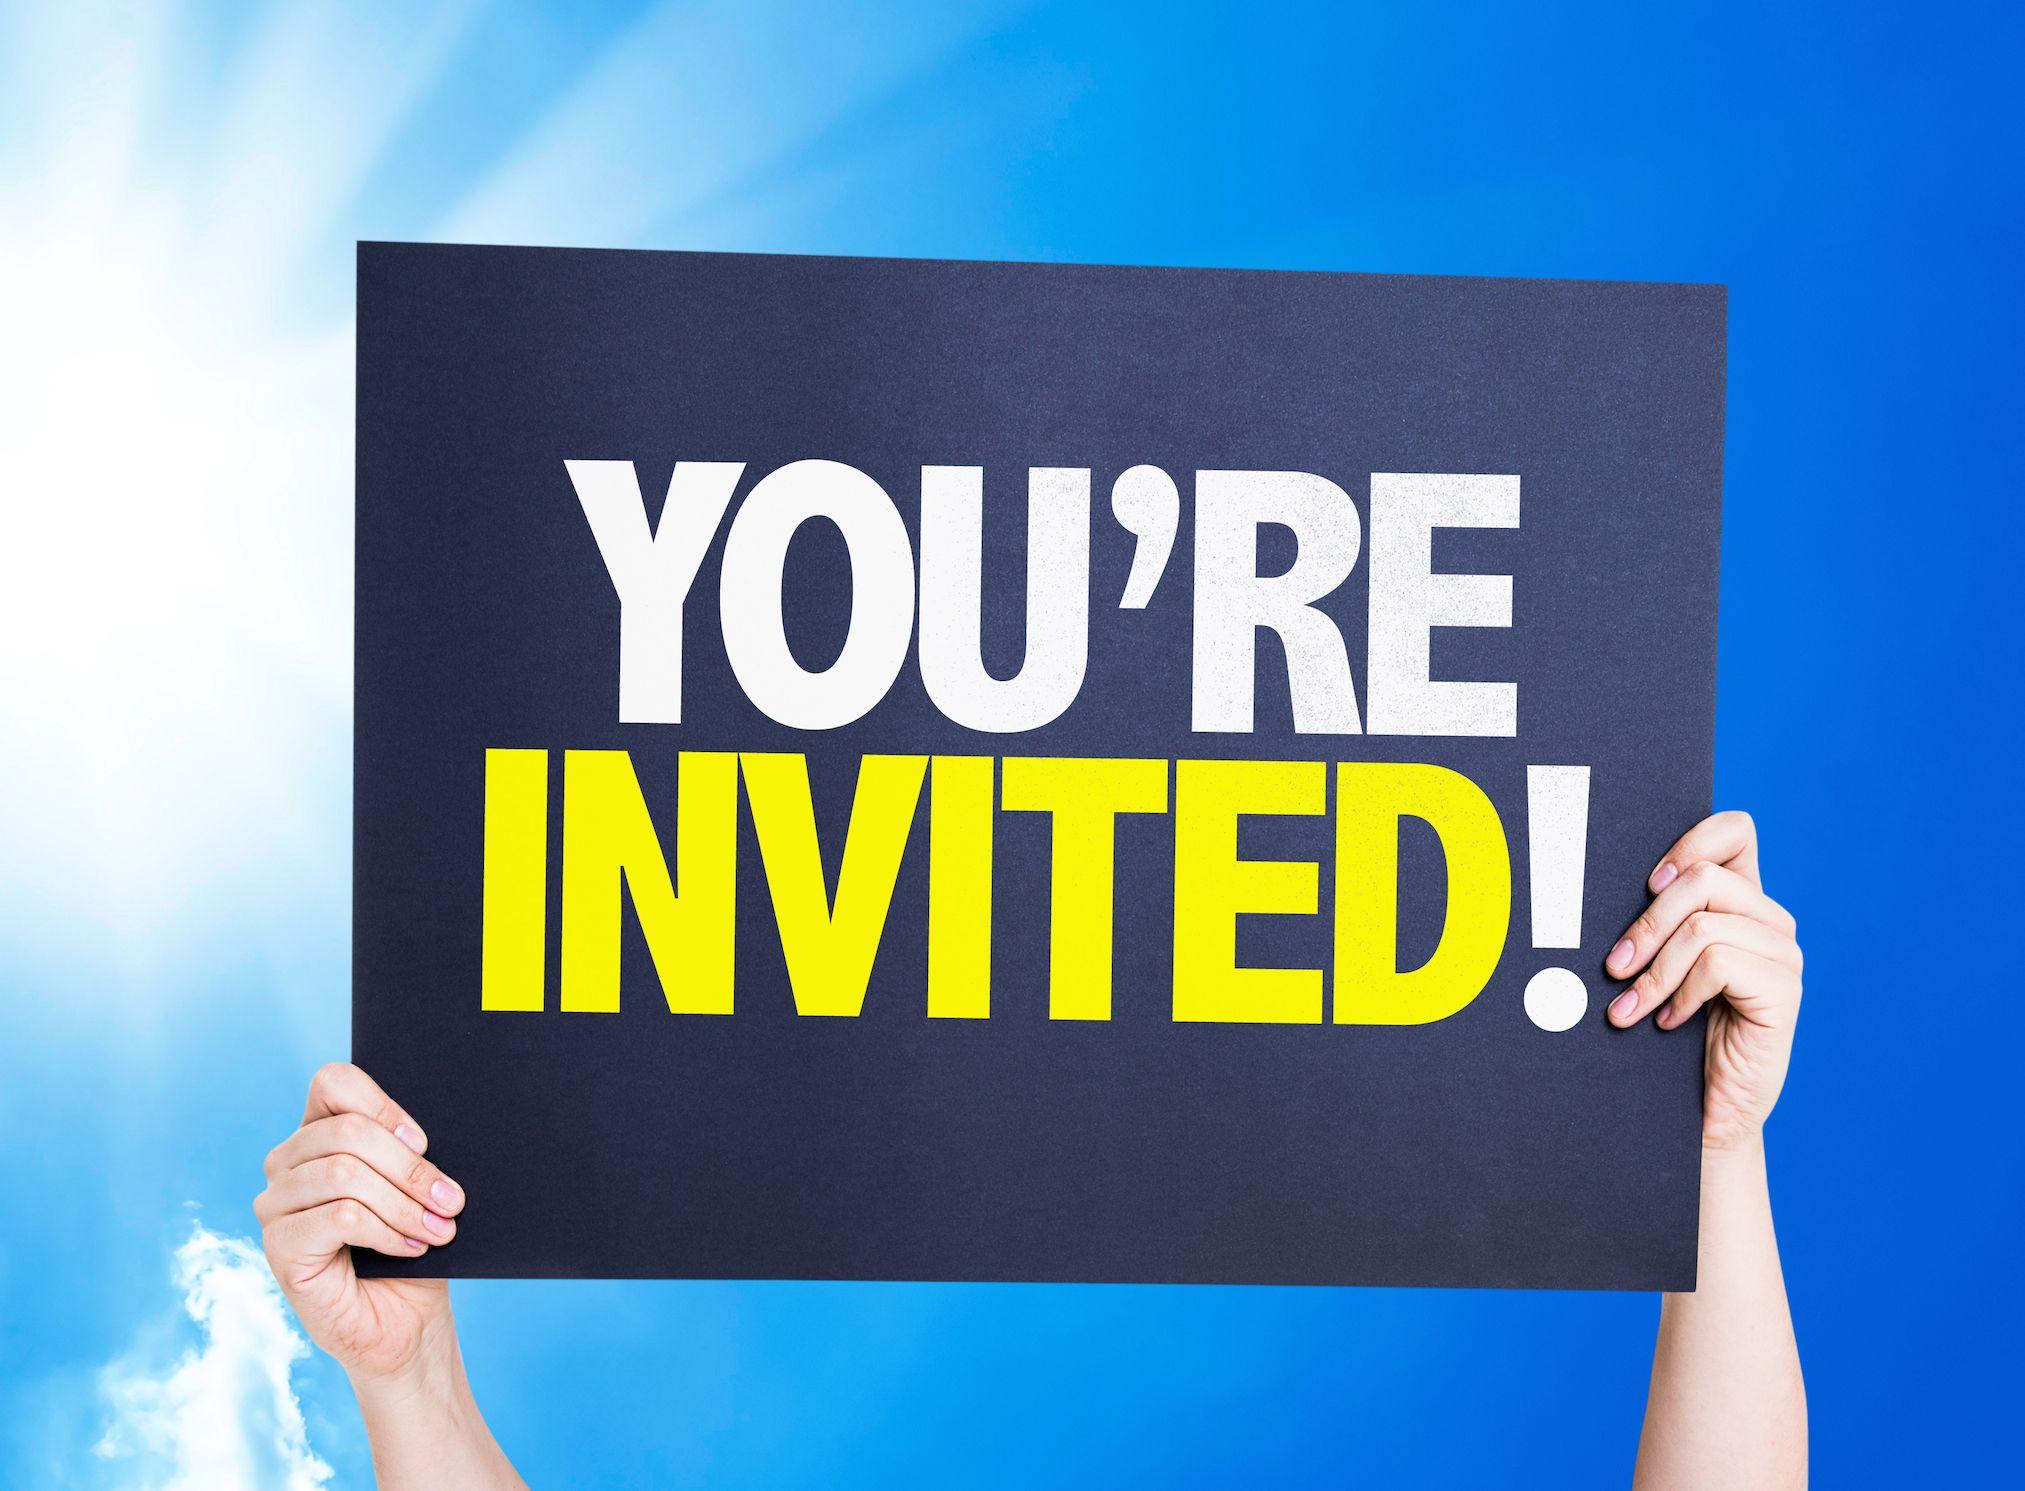 11 Ways to Send an Event Invitation that are not Email #wombizclub https://www.eventbrite.co.uk/blog/11-ways-to-send-an-event-invitation-that-are-not-email/?utm_term=newsl_uk_201507_art6&ref=2015-07_org_newsl_uk&utm_content=buffer2228c&utm_medium=social&utm_source=pinterest.com&utm_campaign=buffer